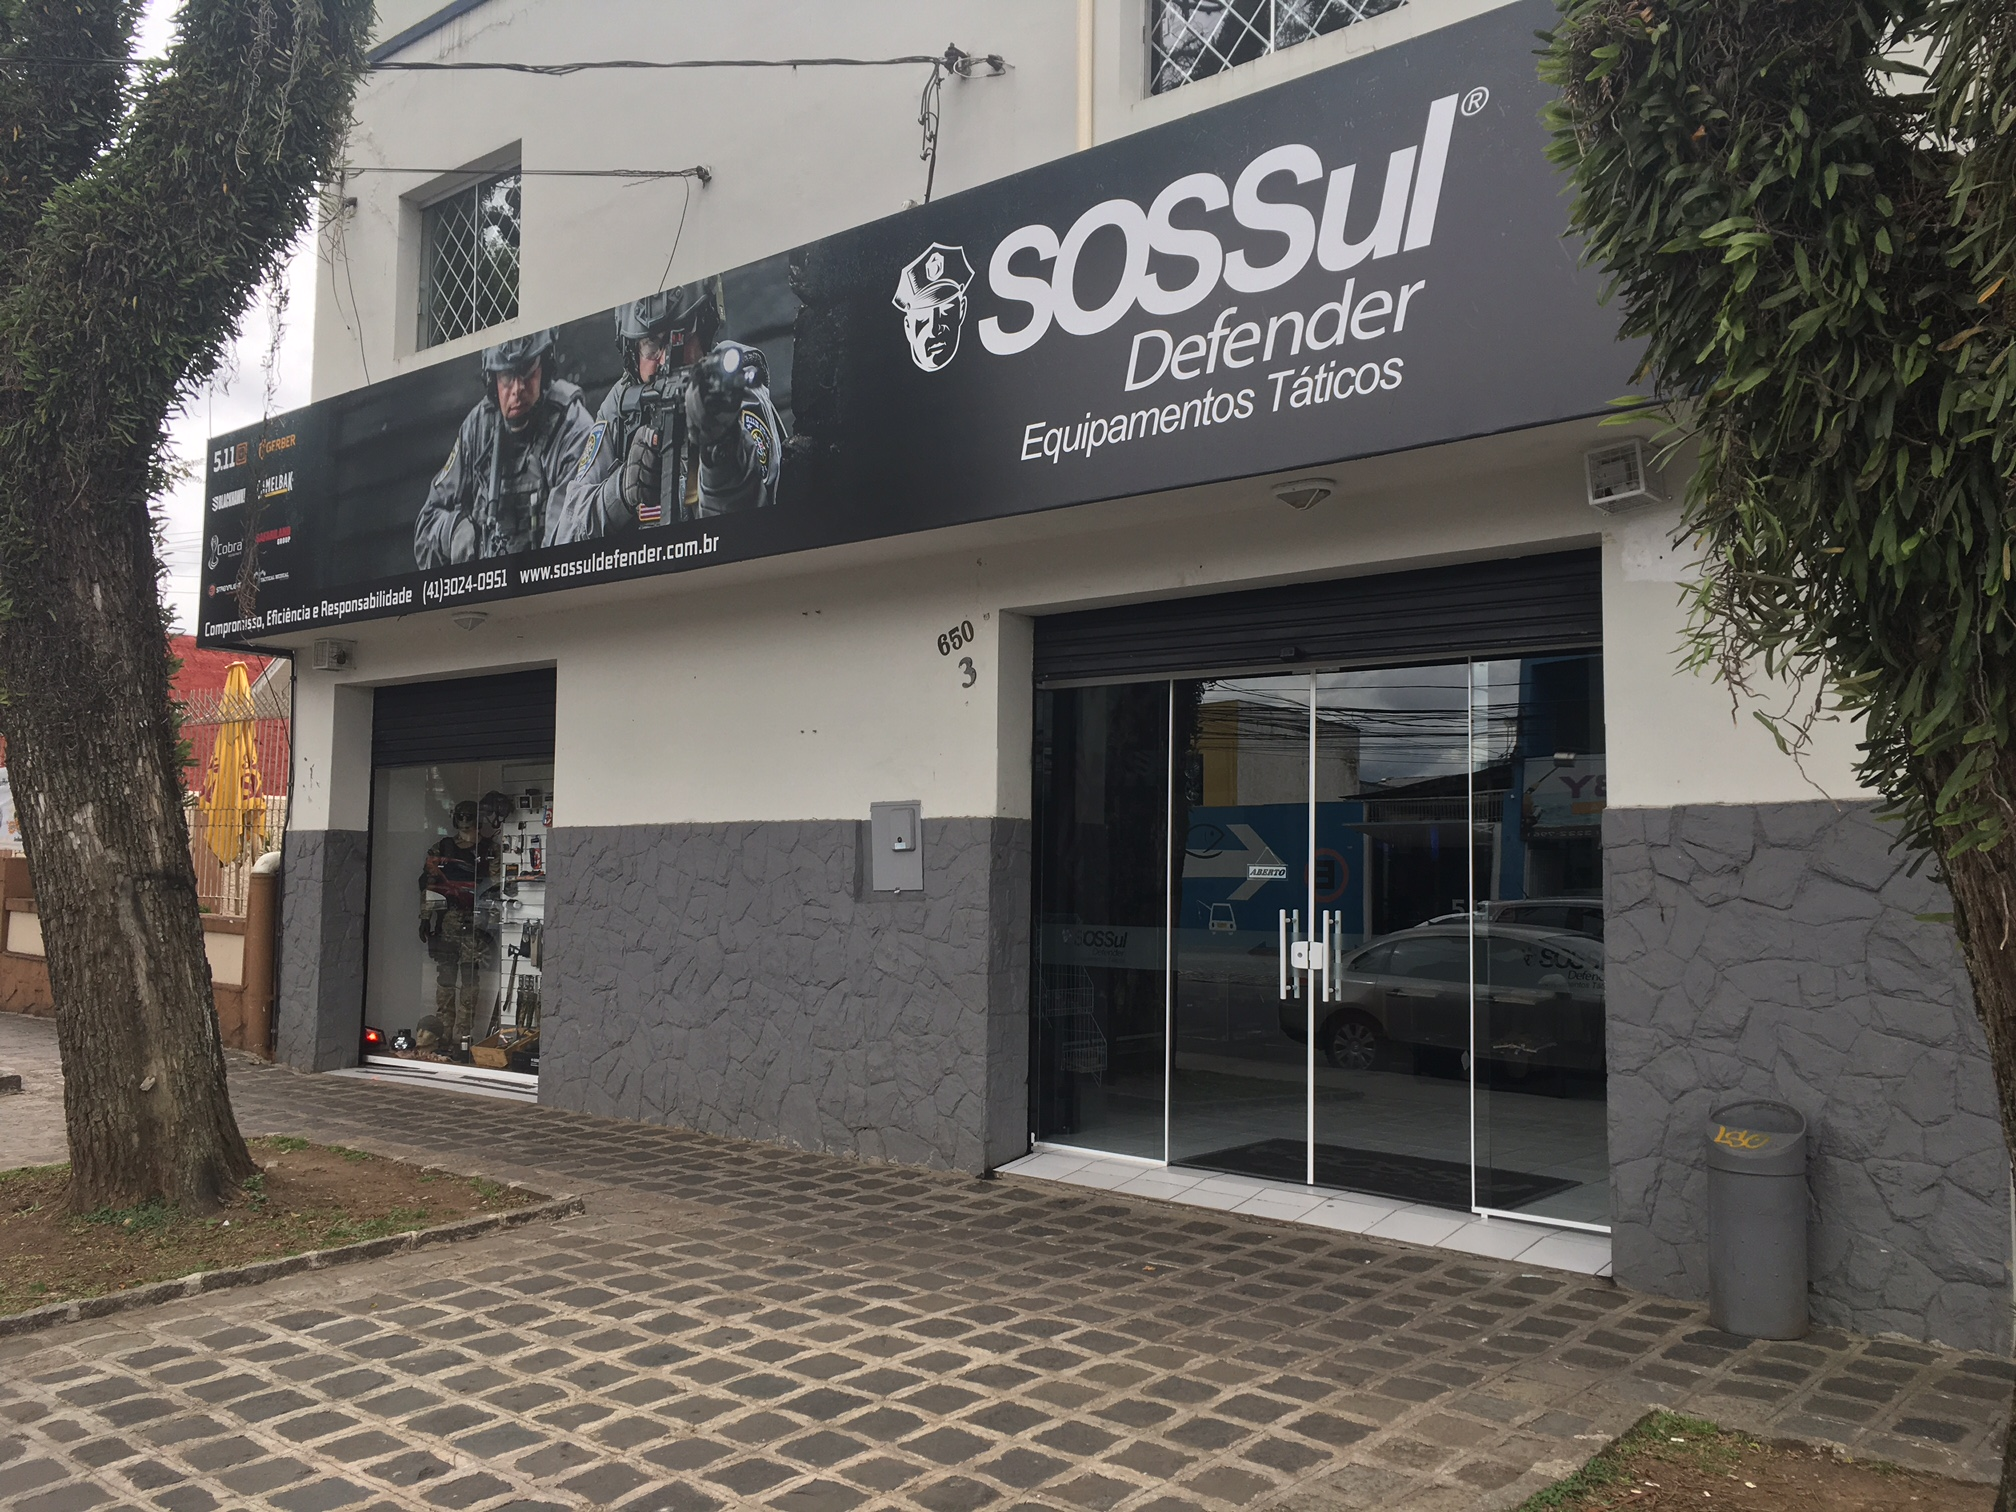 Fachada da SOSSul Defender